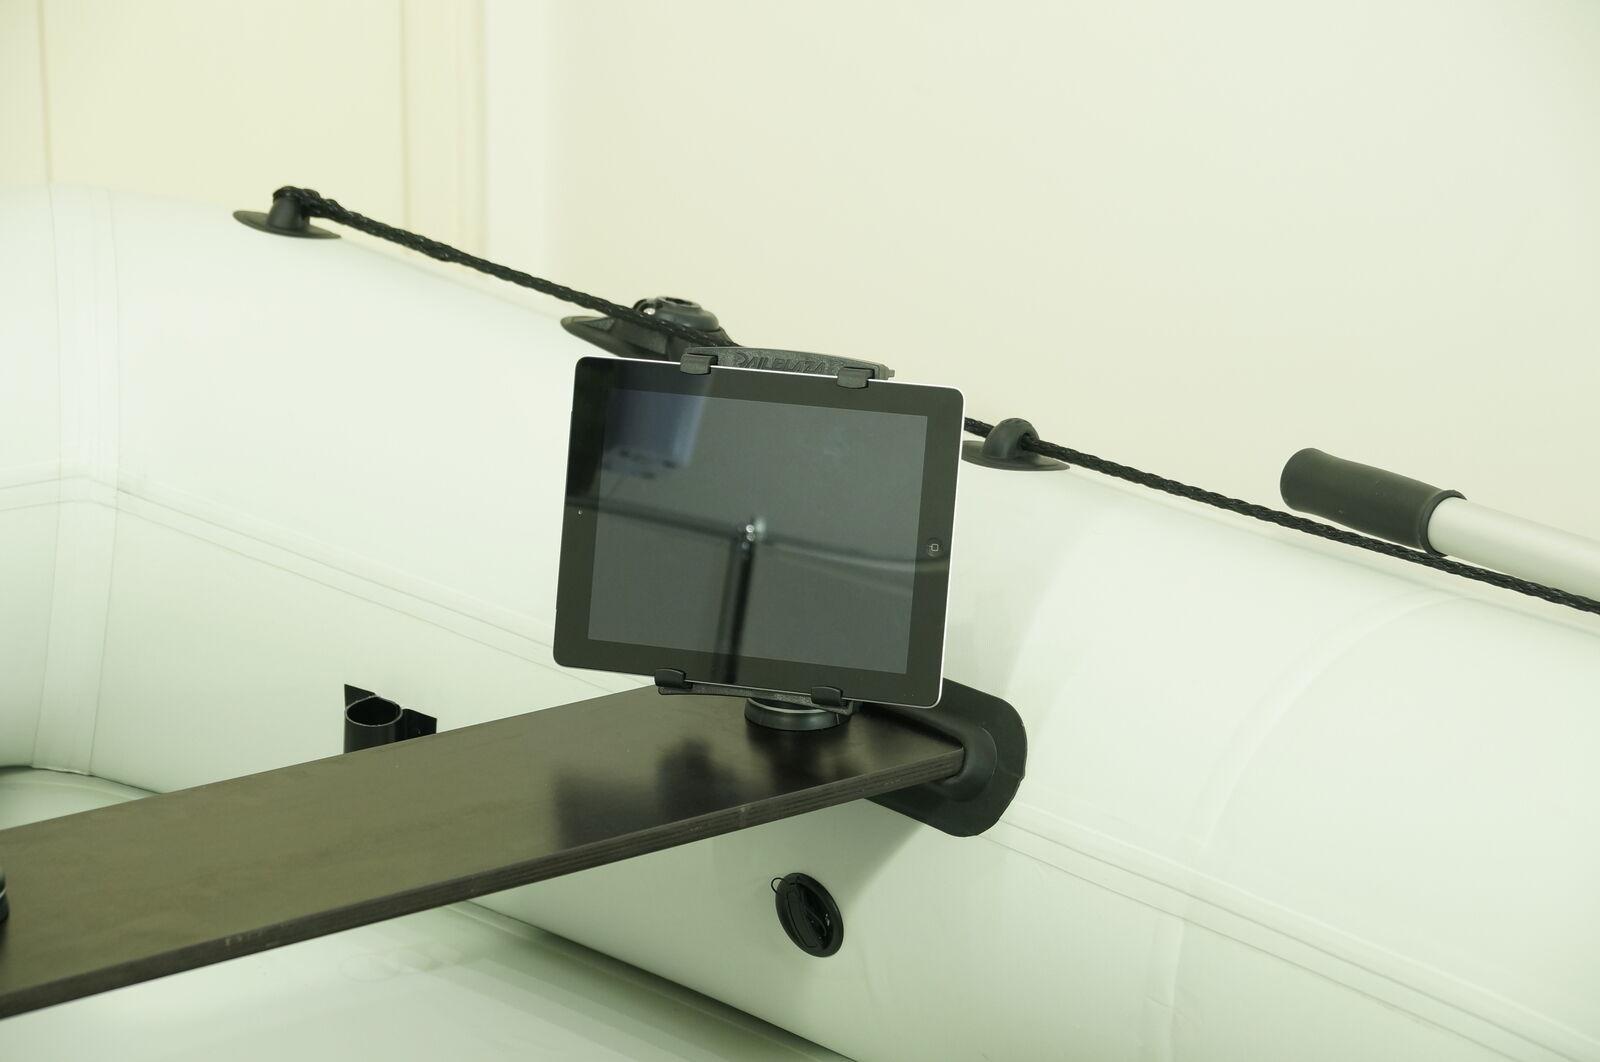 Railblaza Railblaza Railblaza ScreenGrabba, Ipad Galaxy Tab Tablethalter Tablet für Stiefele 02-4045-11 f34edd